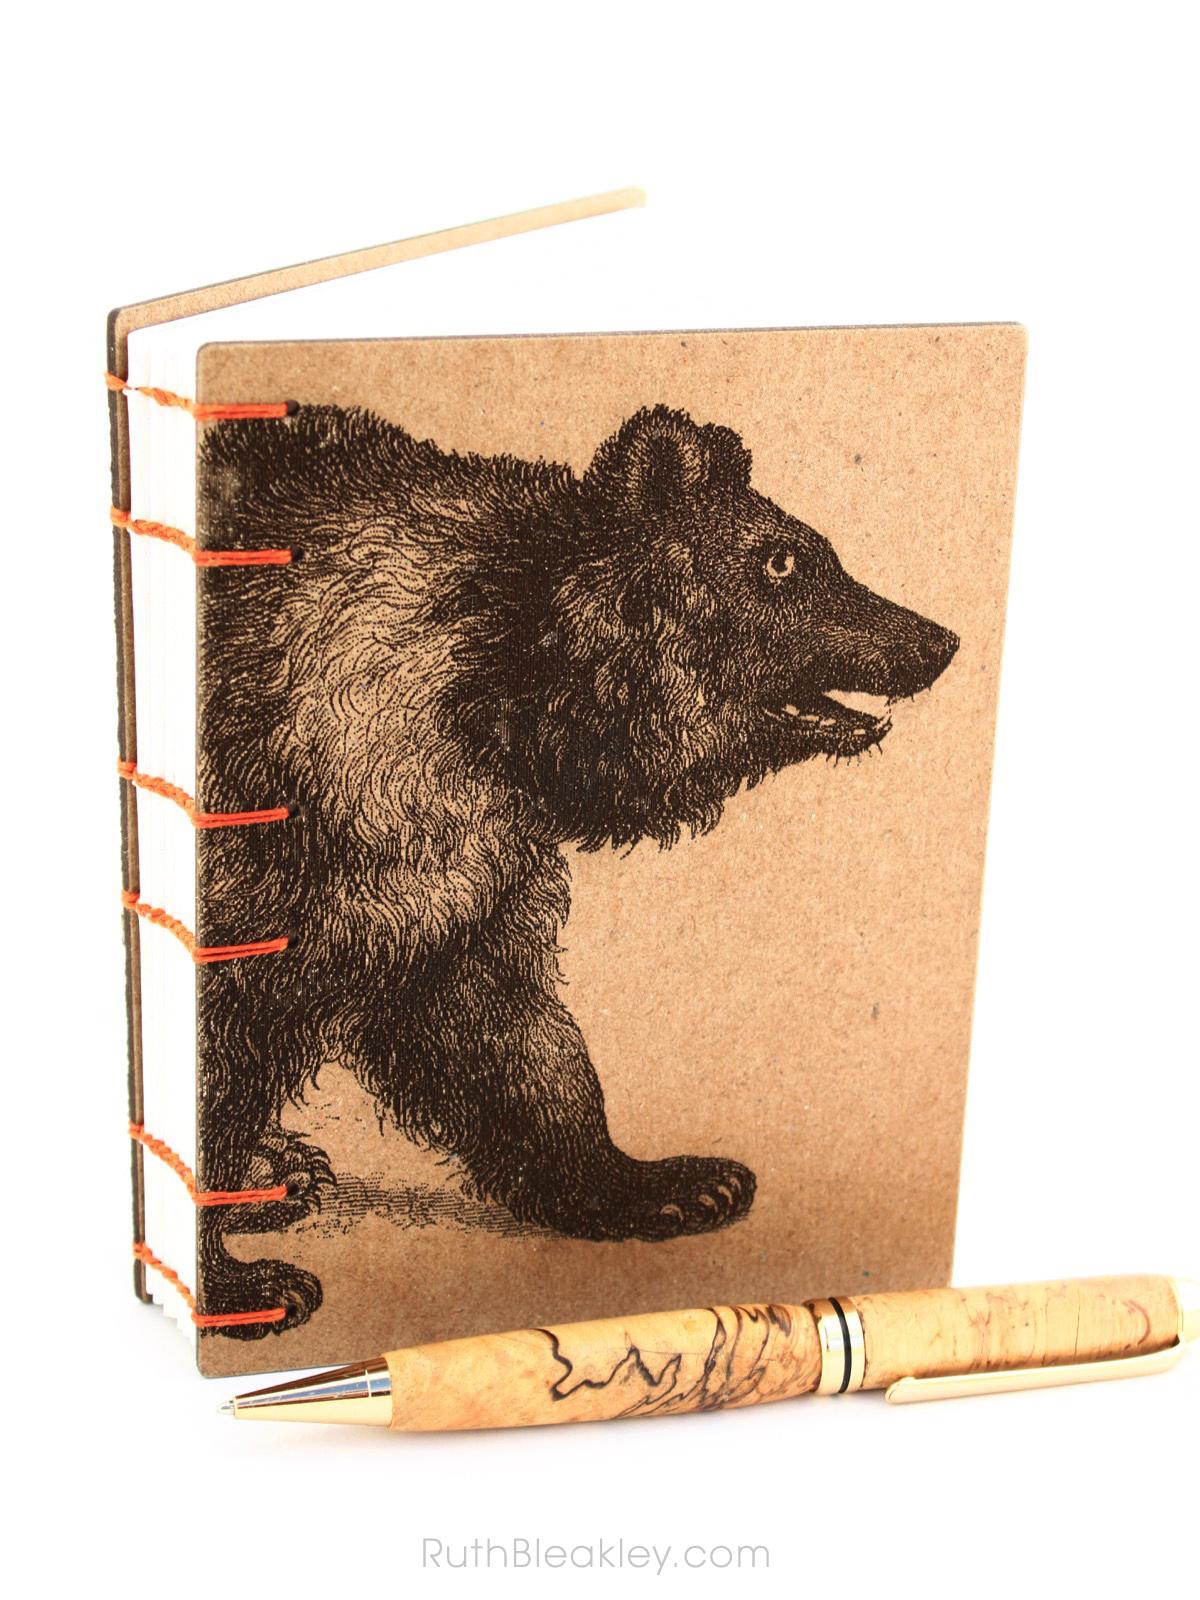 Bear Journal handmade by American book artist Ruth Bleakley - 6